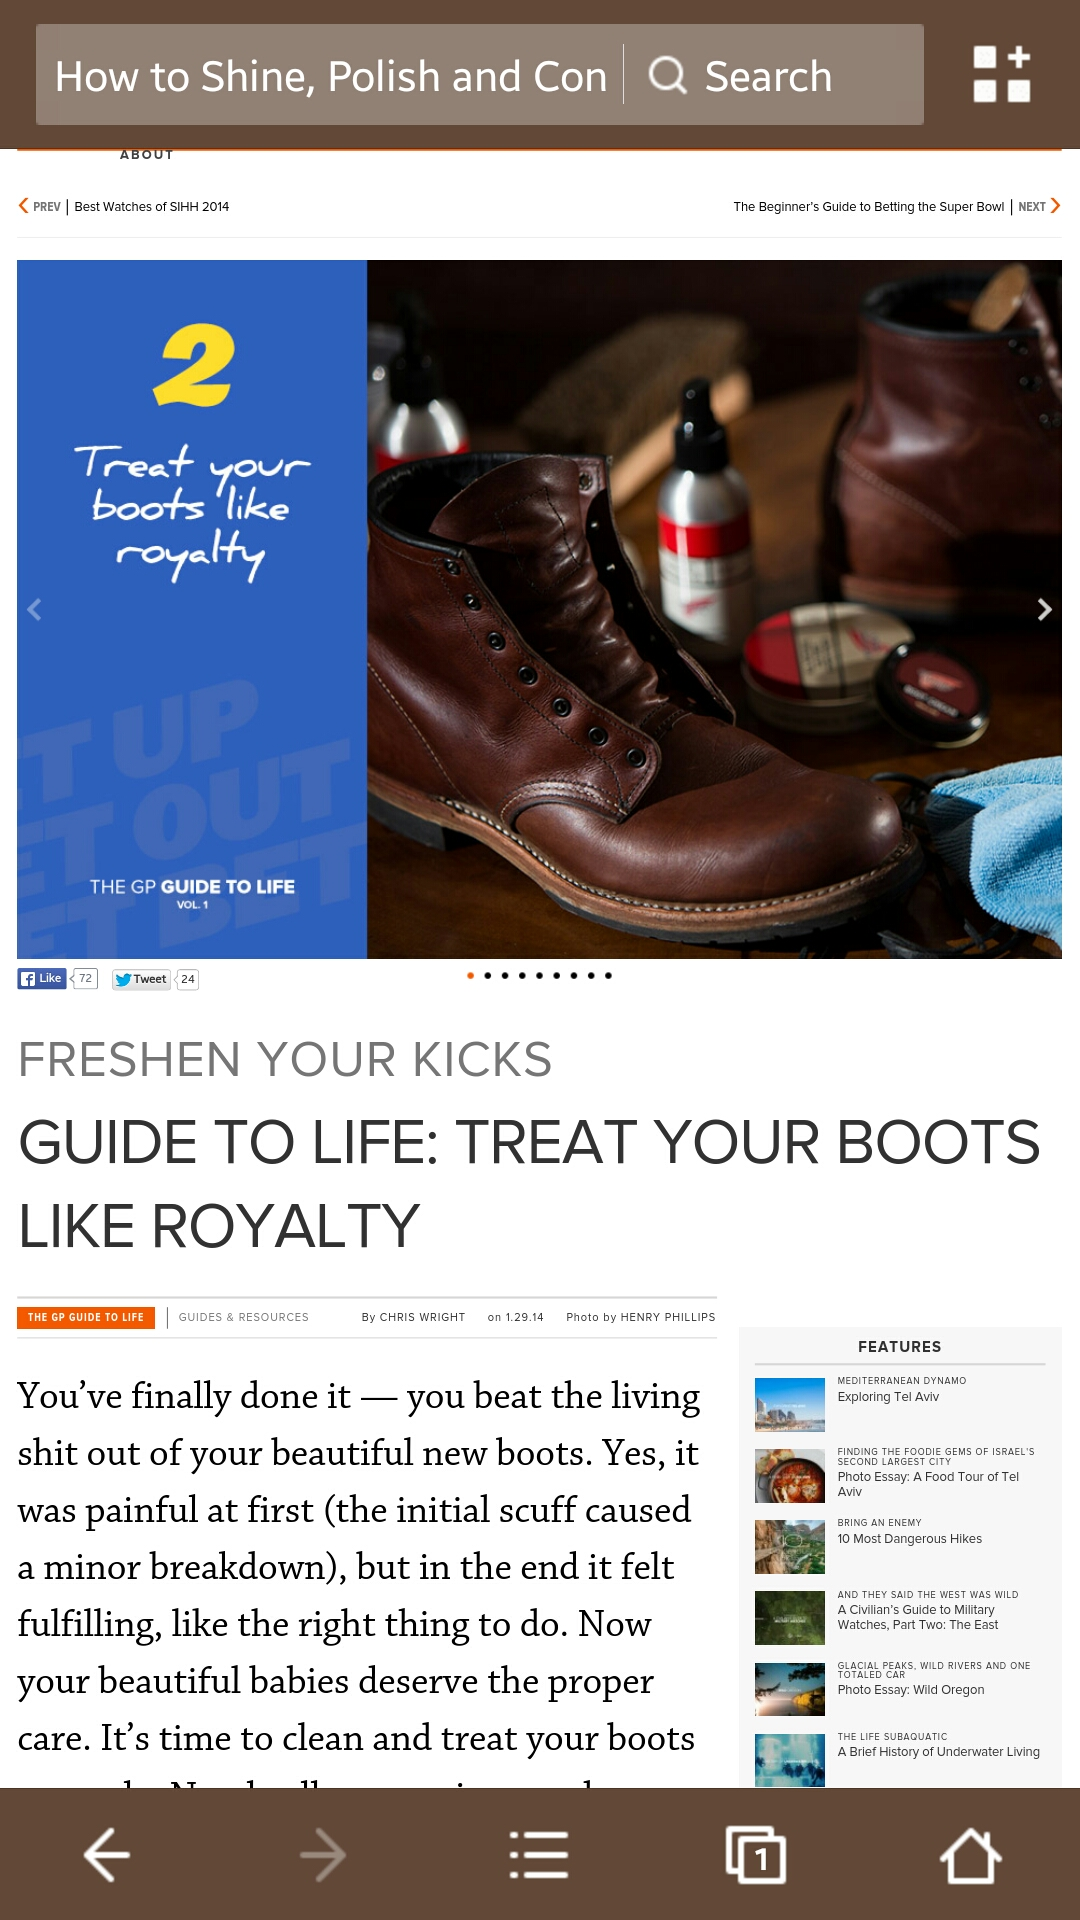 Footwear - Magazine cover